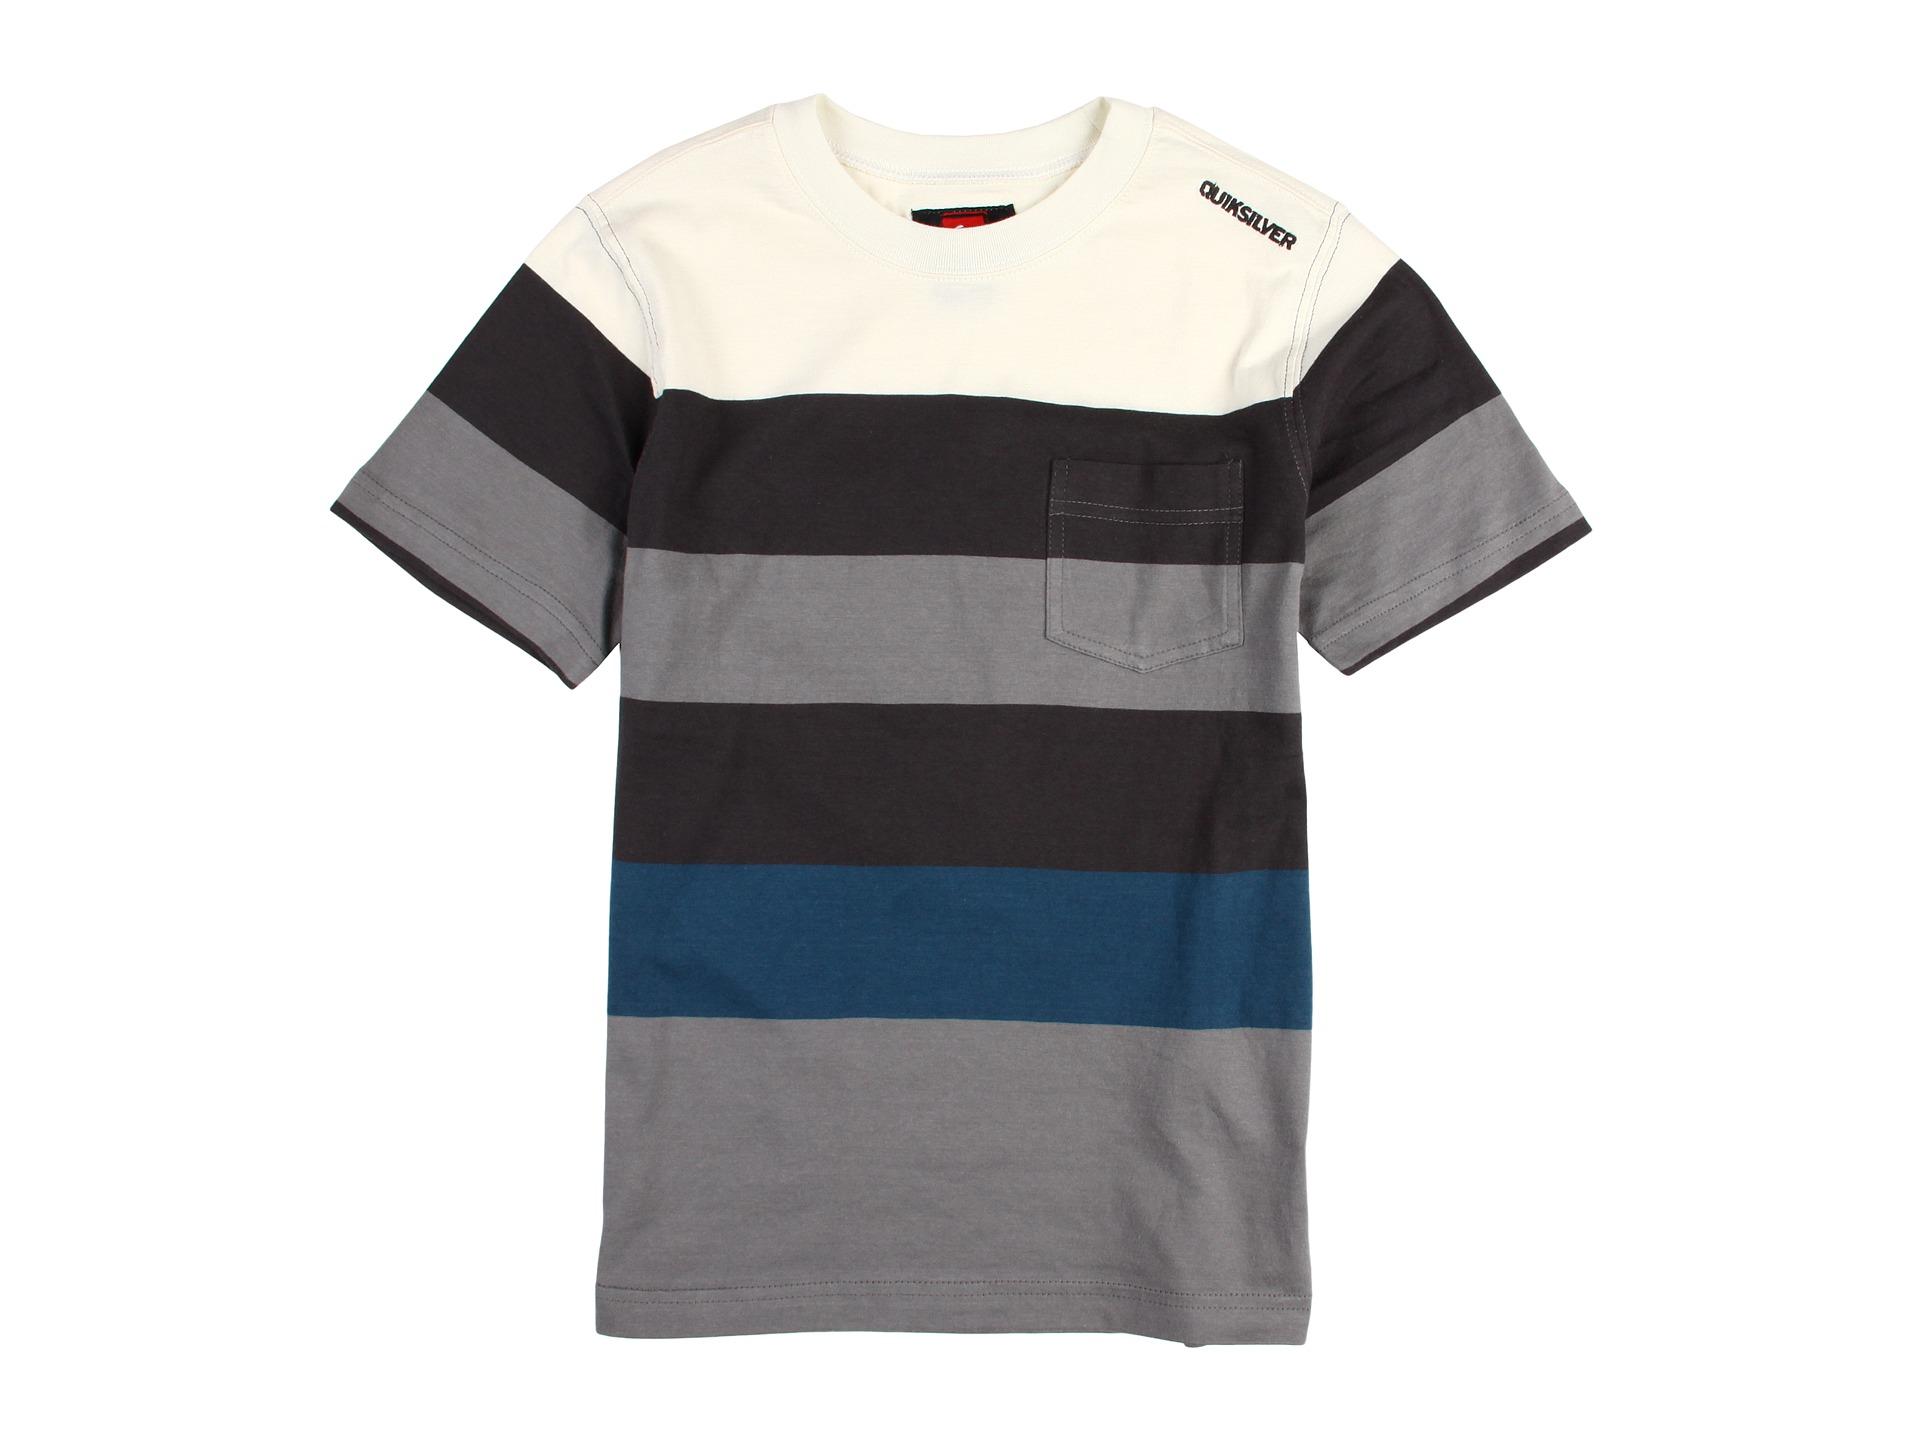 Quiksilver Kids Wild Card Sweater (Big Kids) $36.99 $46.00 SALE